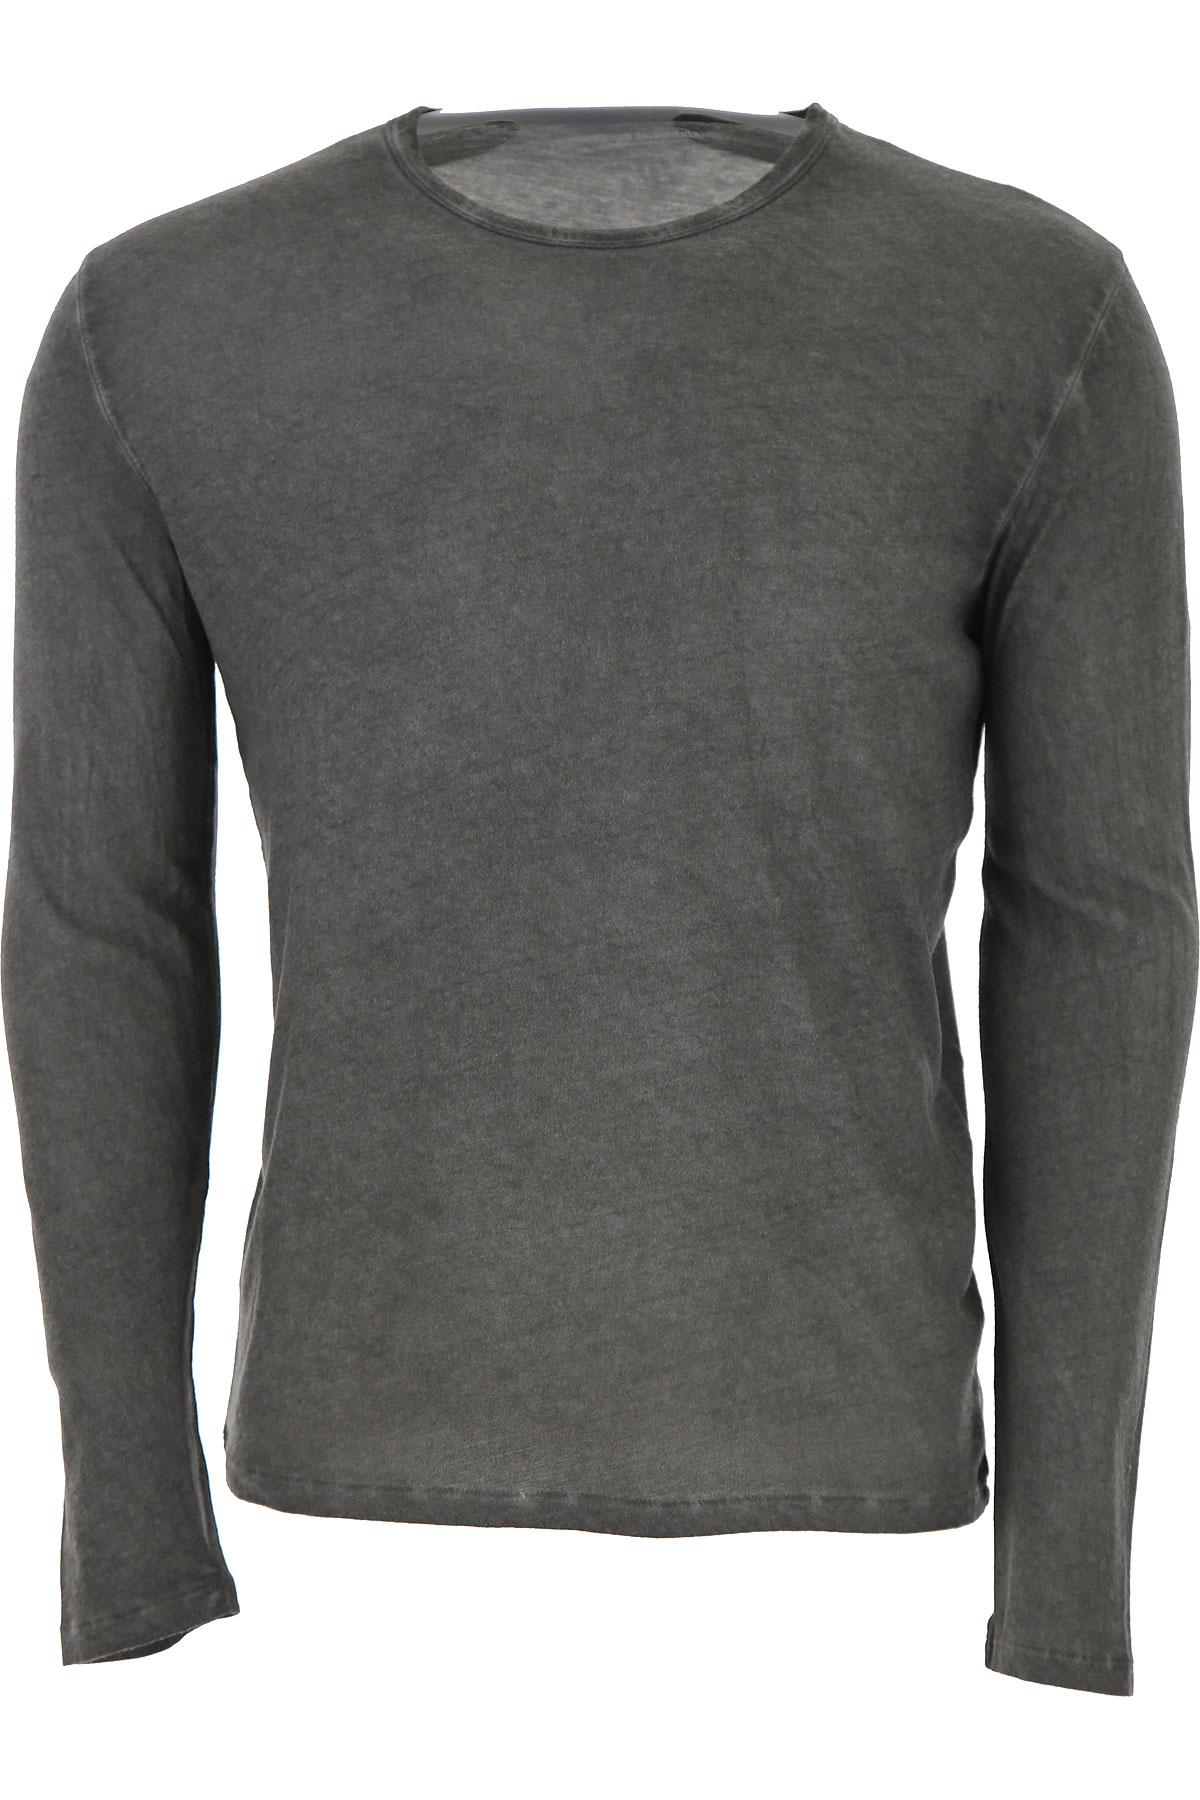 Image of Majestic Filatures T-Shirt for Men, Grey, Cotton, 2017, L M S XS